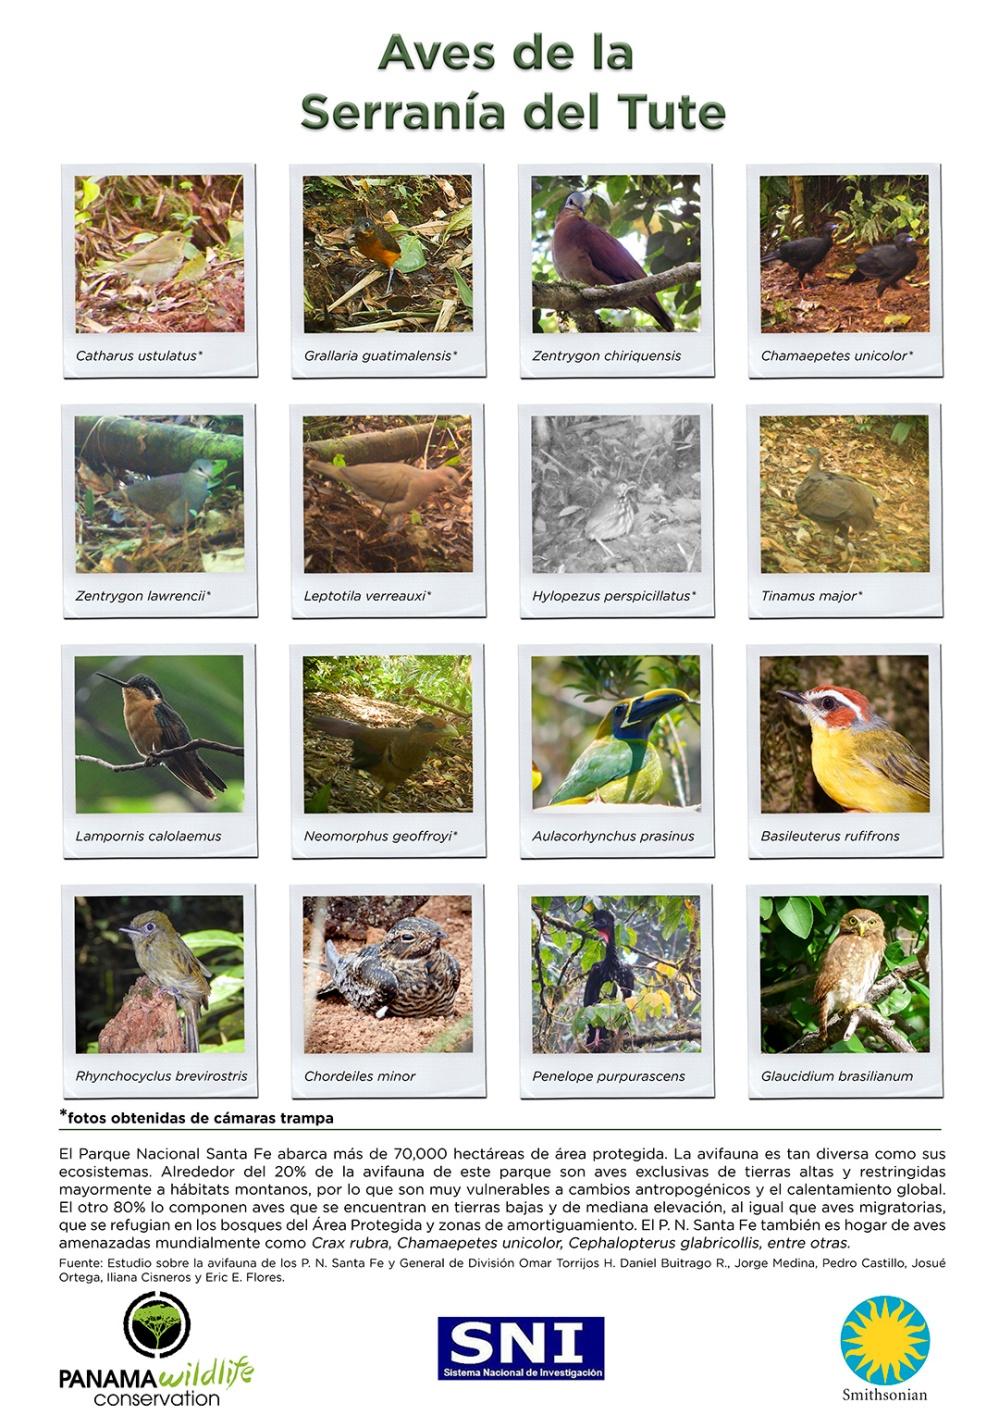 Puede ver e imprimir el poster en mayor resolución en este enlace: http://www.stri.si.edu/images/media/Aves_PN_SantaFe.jpg